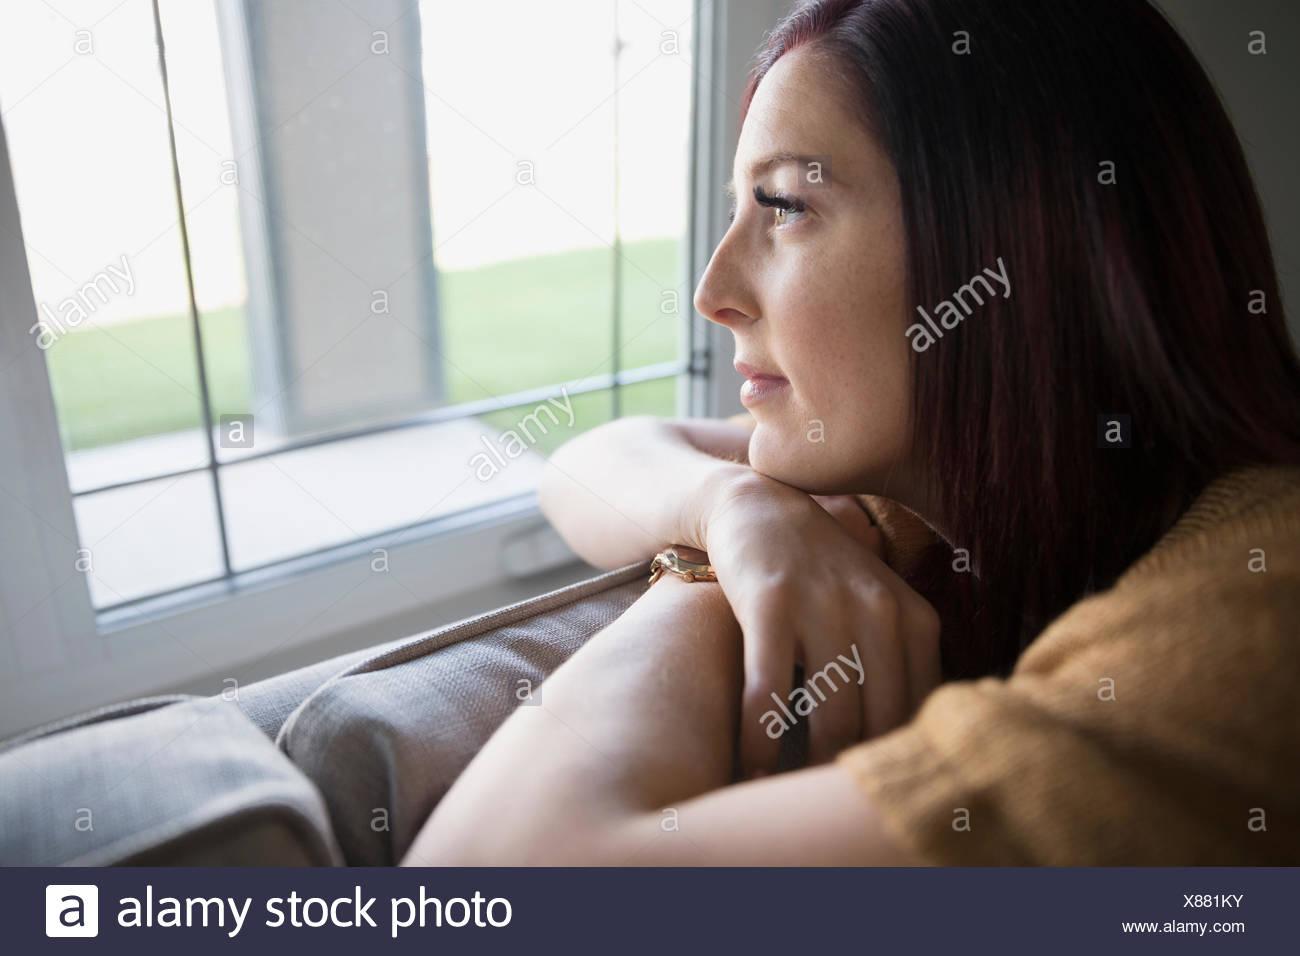 Nachdenkliche Frau auf Sofa Blick aus Fenster Stockbild